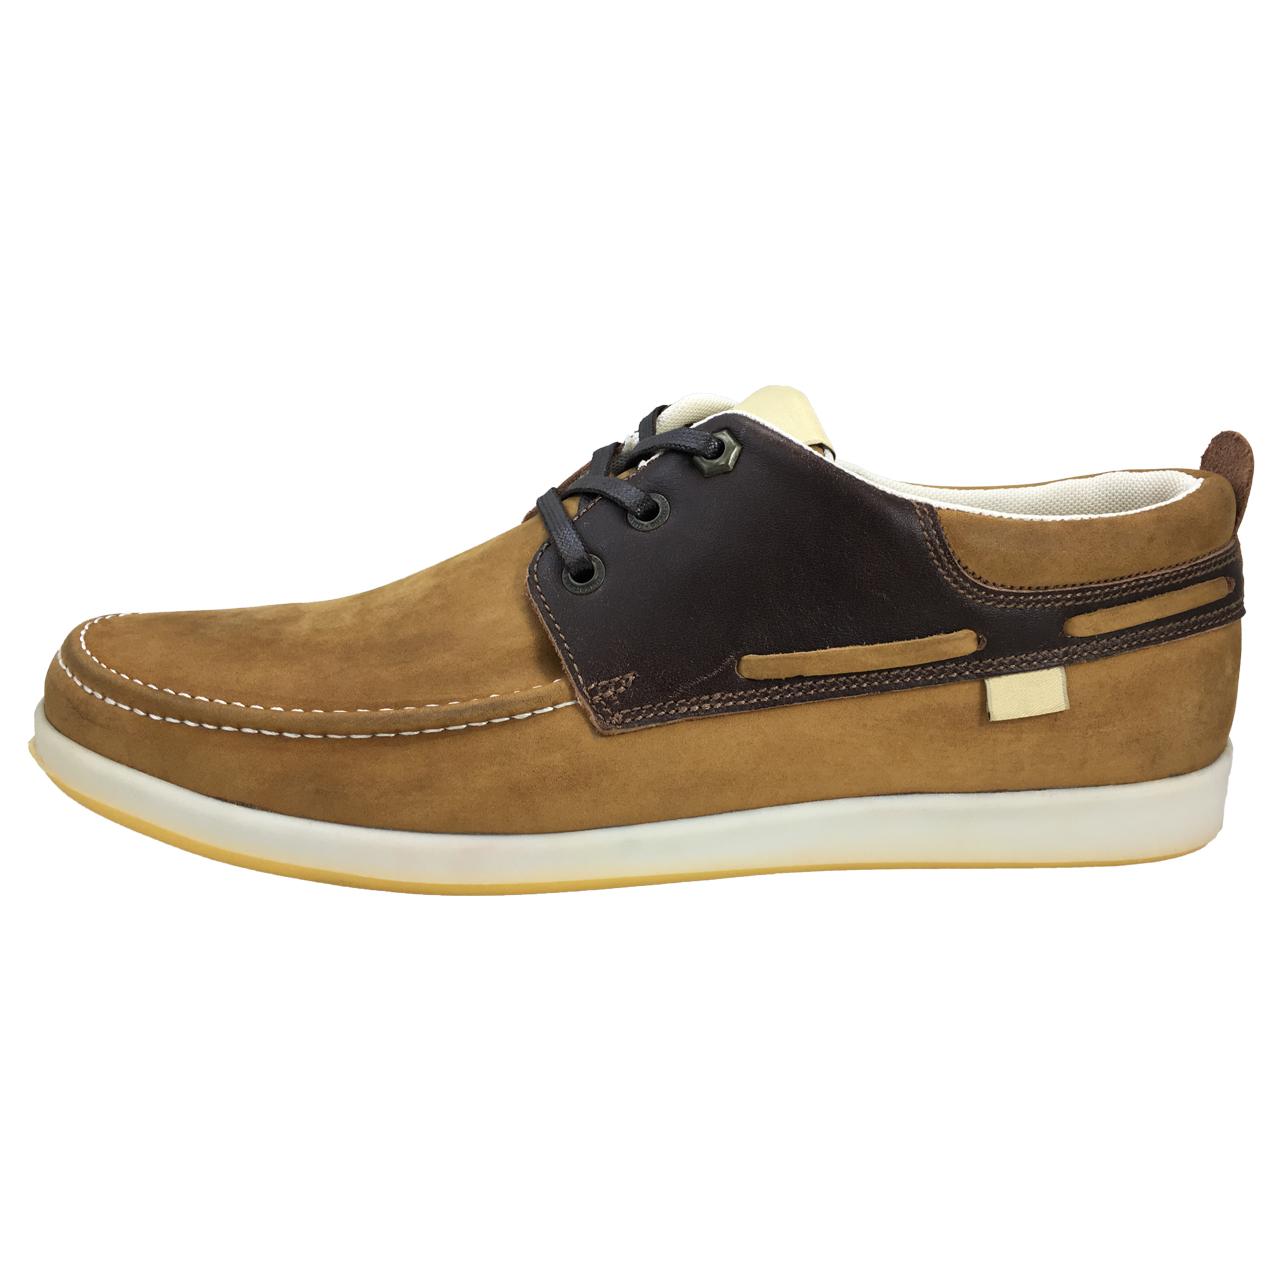 قیمت کفش مردانه چرم مدل آتا کد 2413